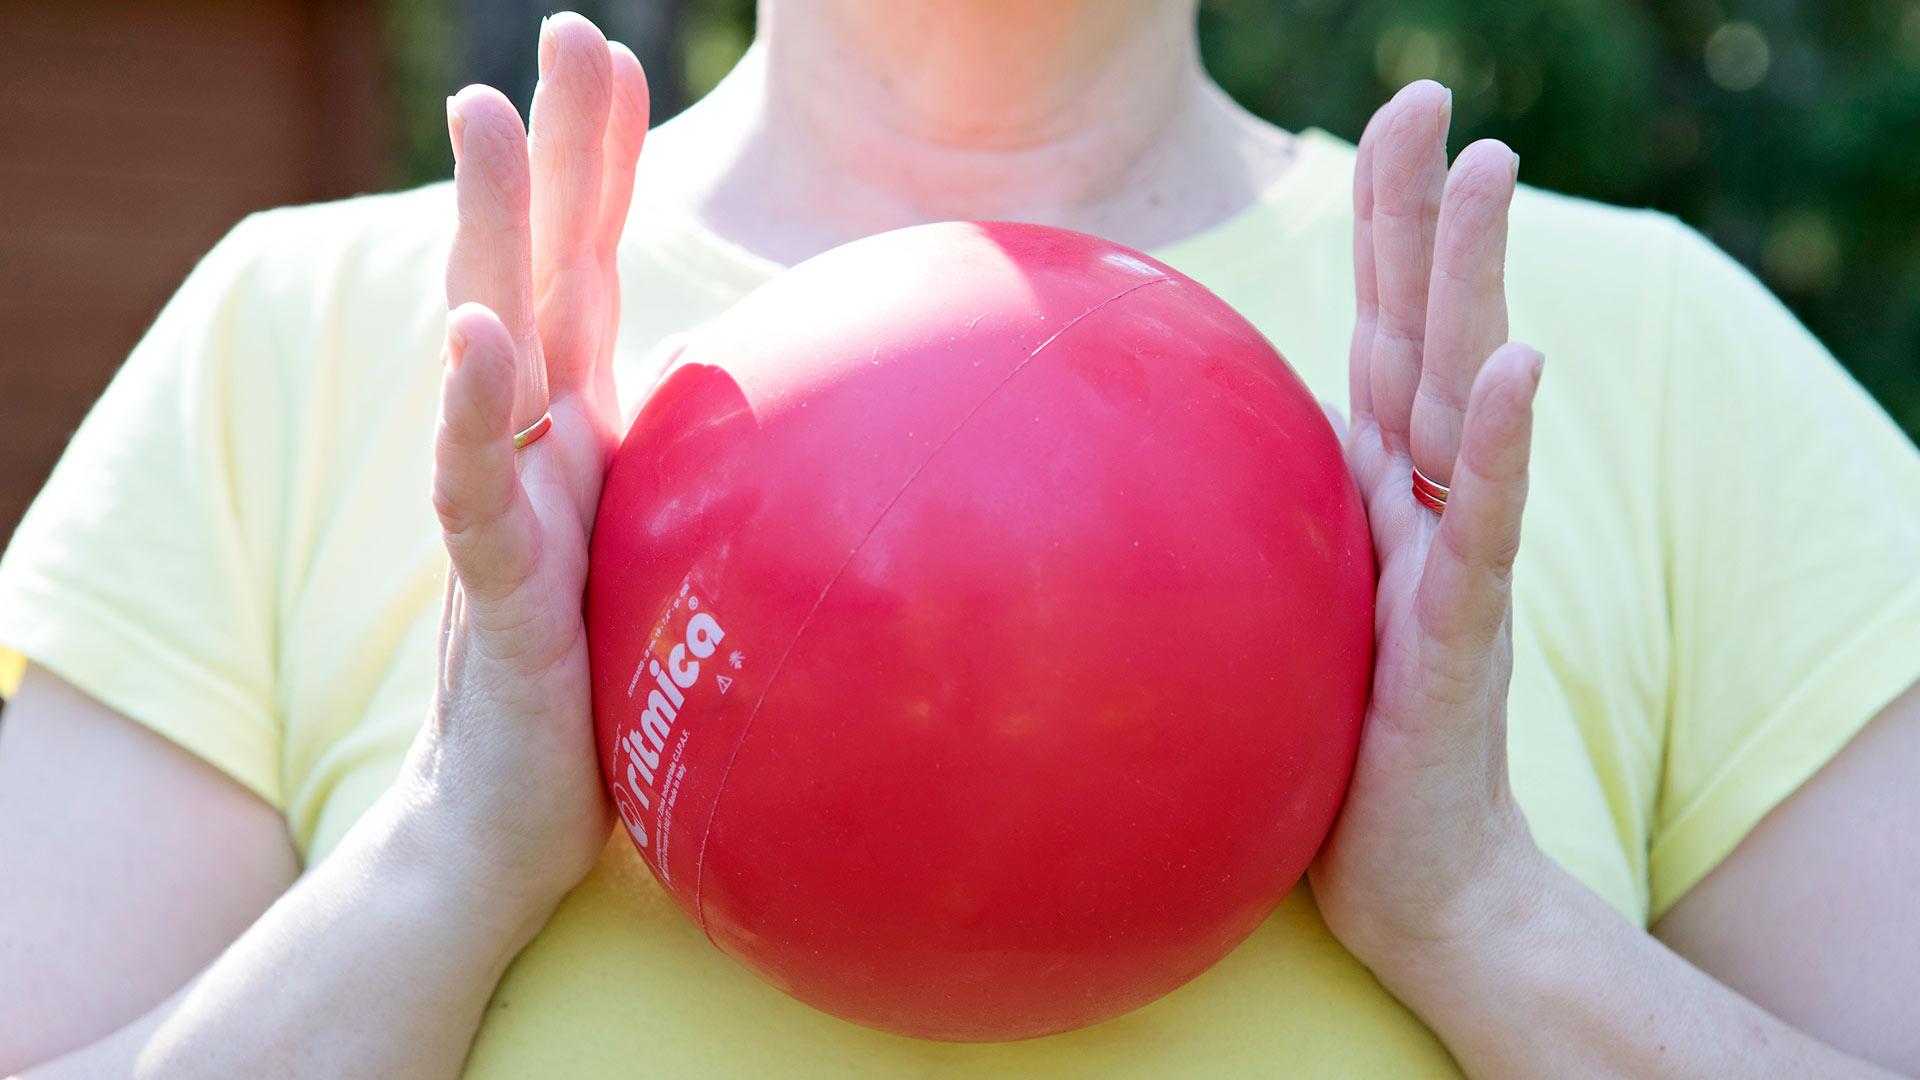 Pilatespallo